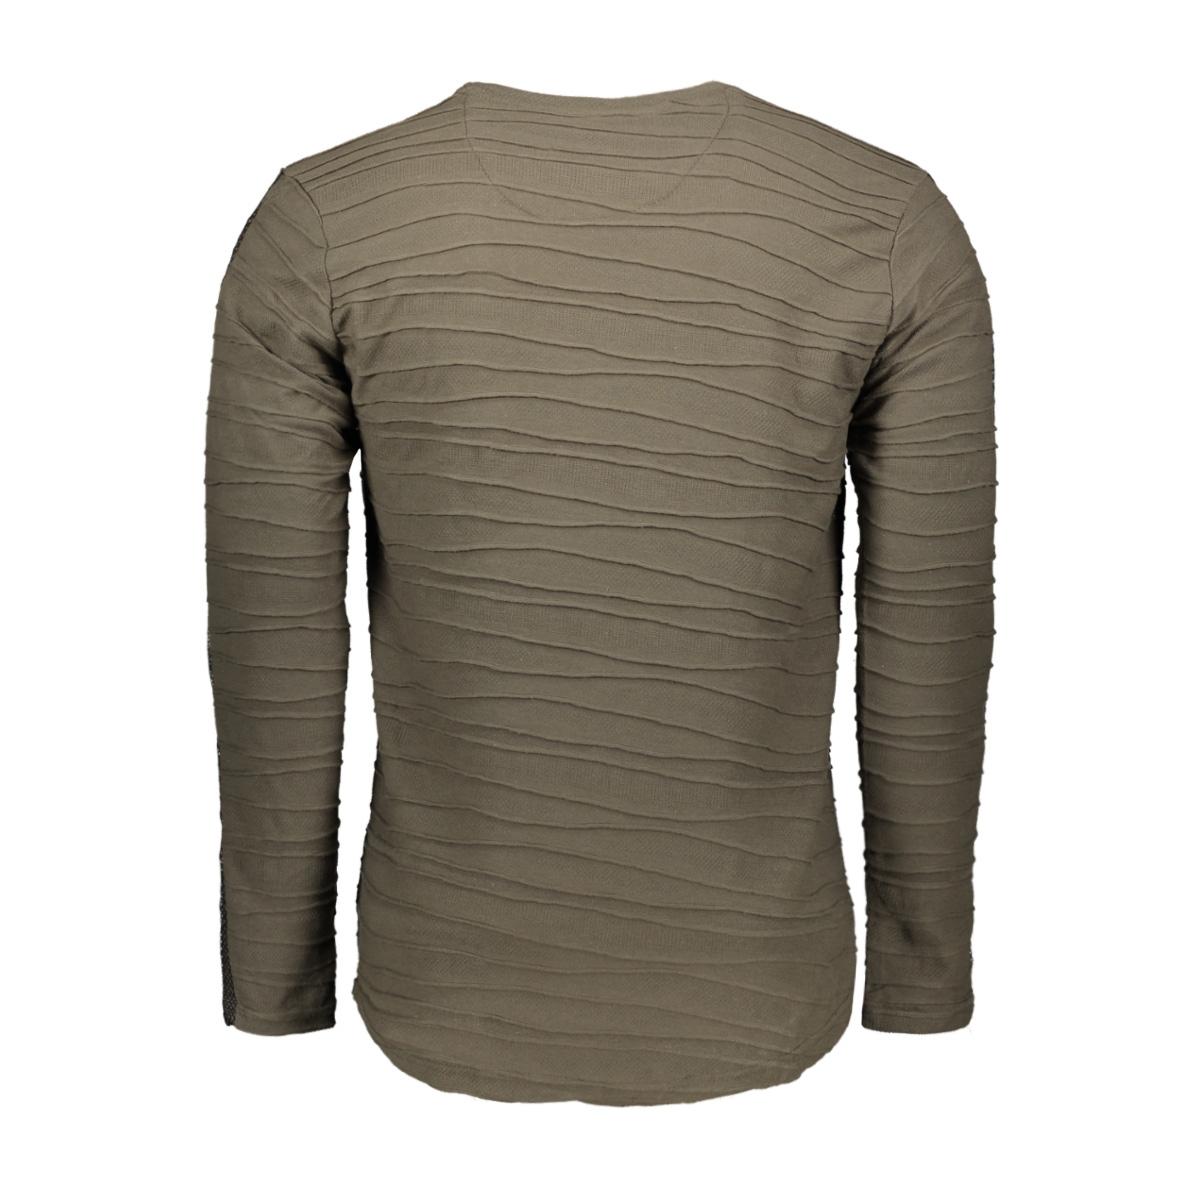 longsleeve 15167 gabbiano t-shirt army